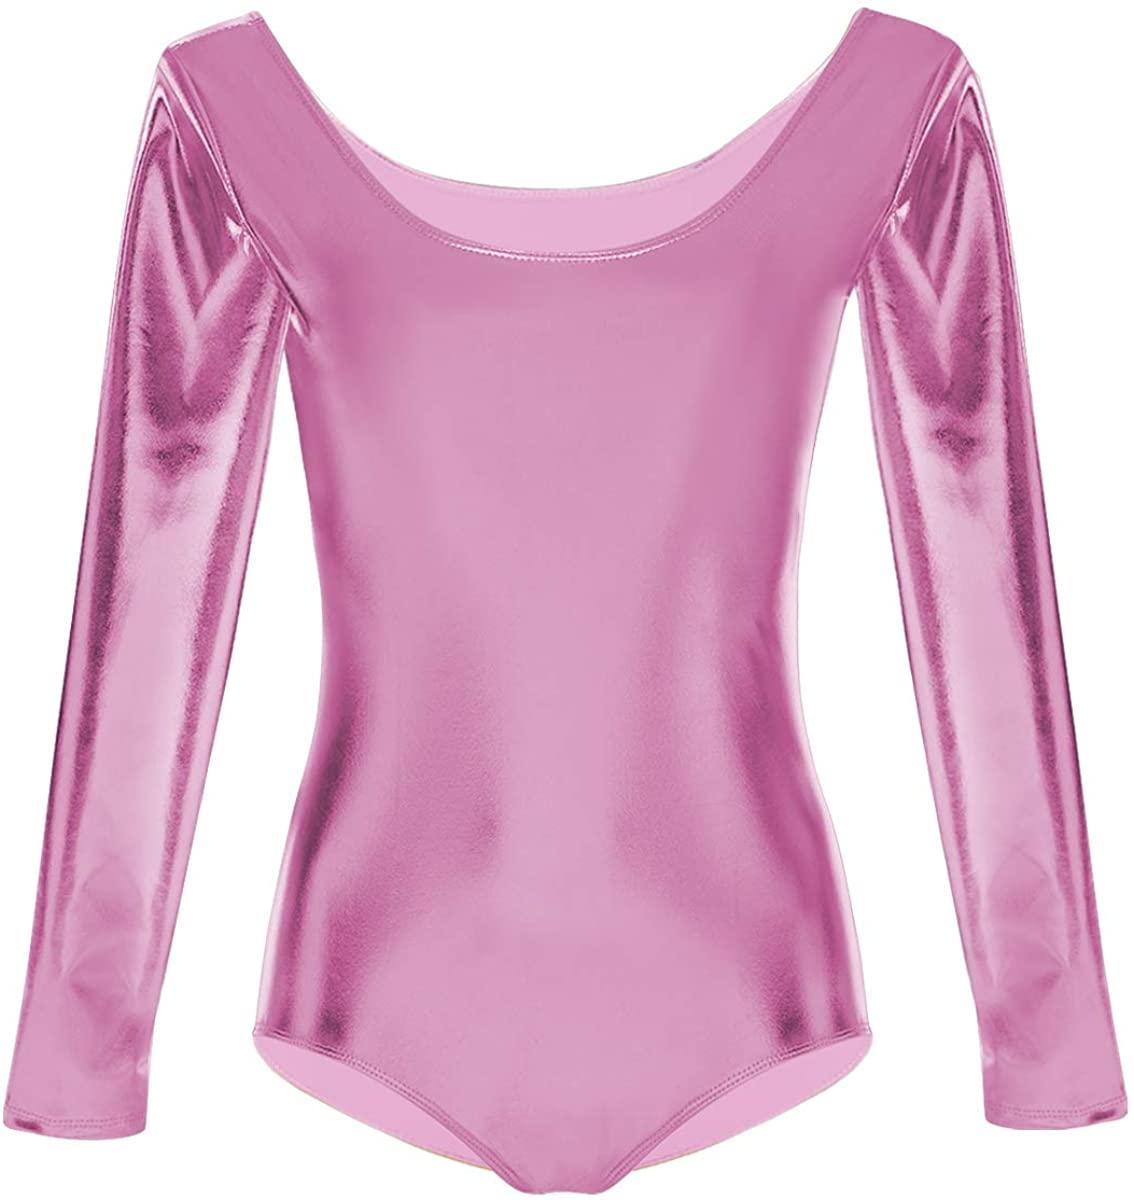 Kids Girls Metallic Leotard Gymnastics Ballet Dancewear Long Sleeve One-Piece Shiny Bodysuit Dance Competition Costume